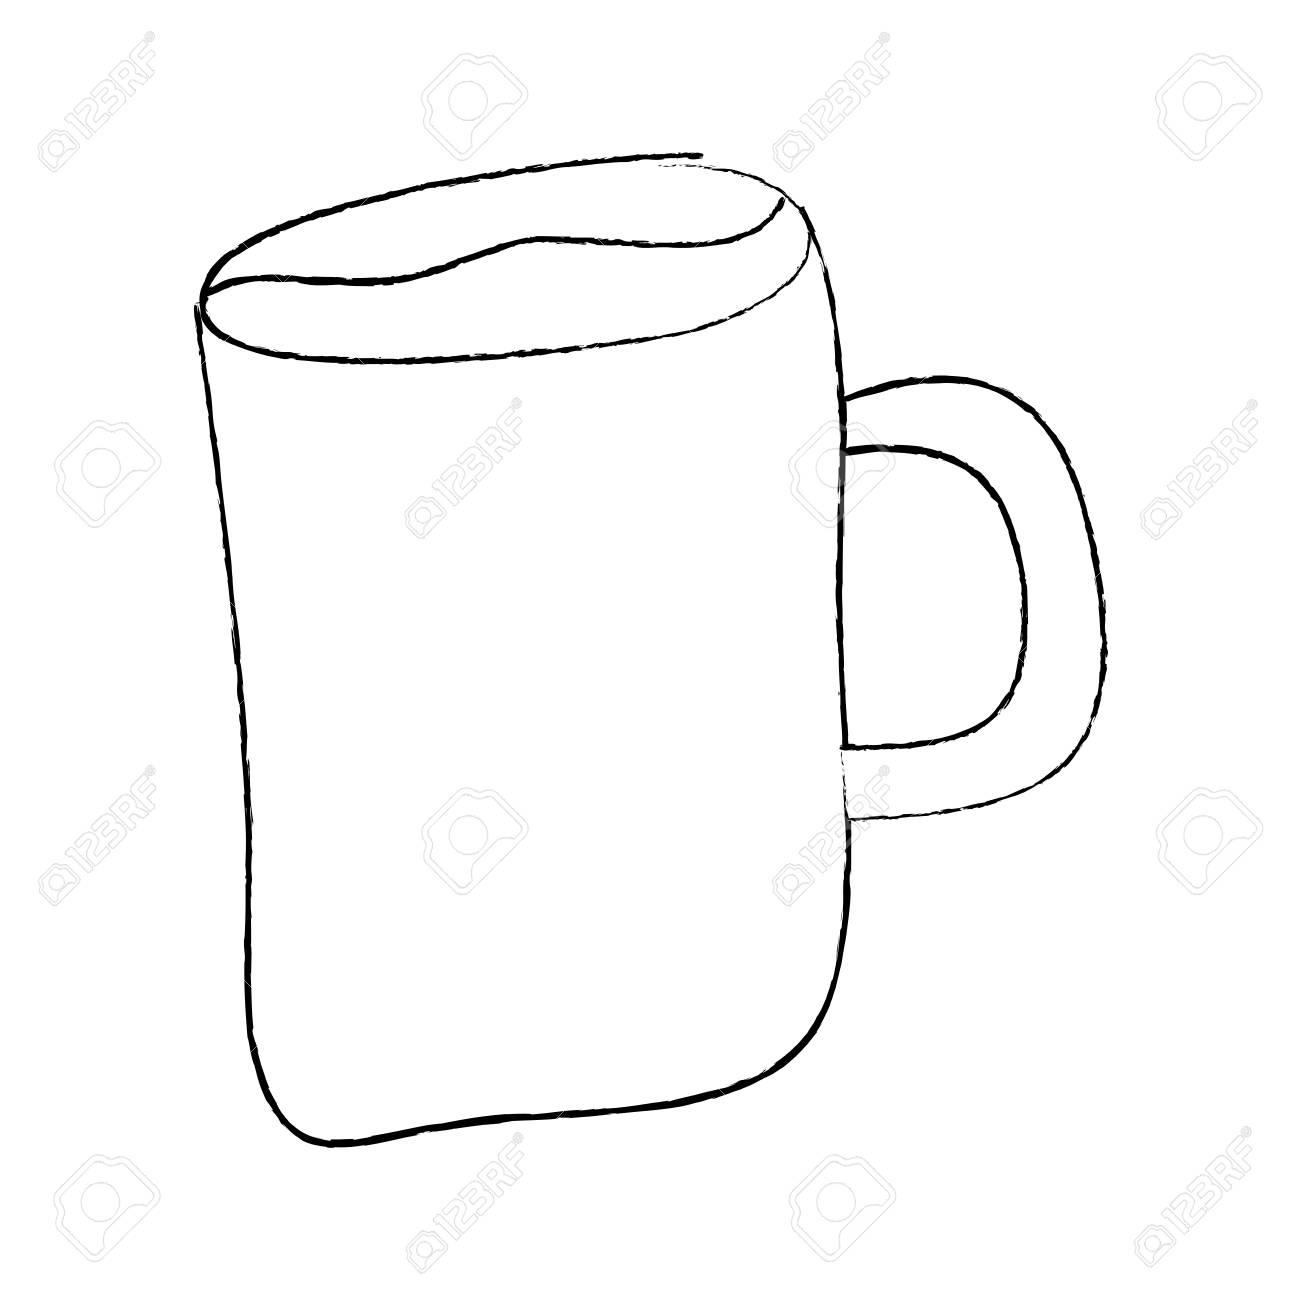 Cartoon Coffee Mug Drink Beverage Vector Illustration Sketch Royalty Free Cliparts Vectors And Stock Illustration Image 96072255